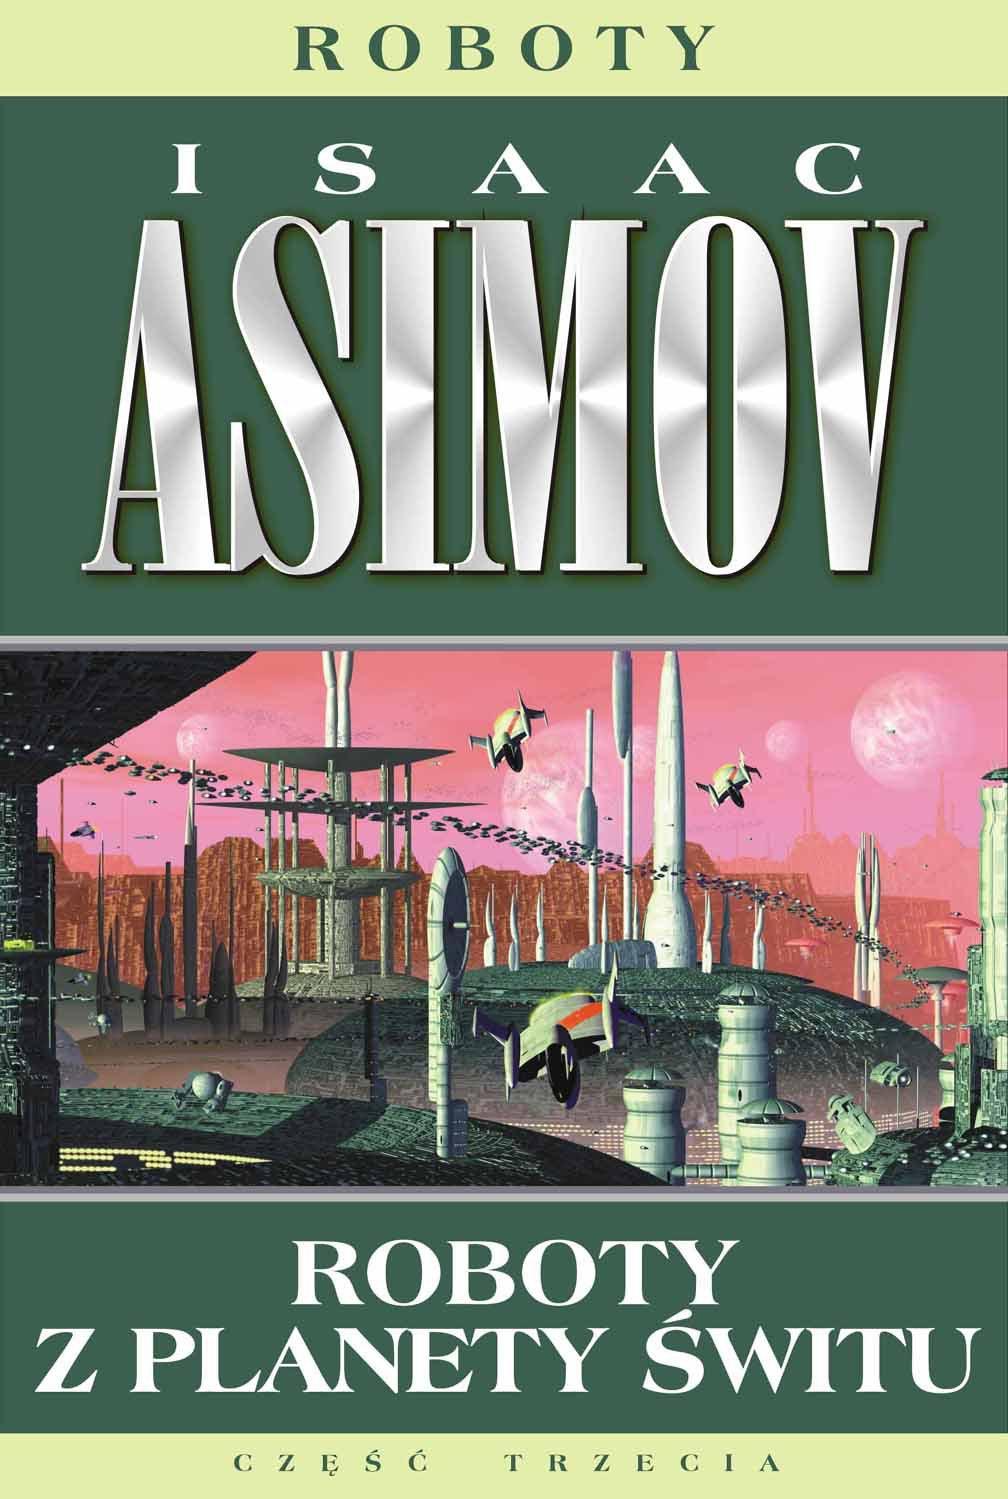 Roboty z planety świtu - Isaac Asimov